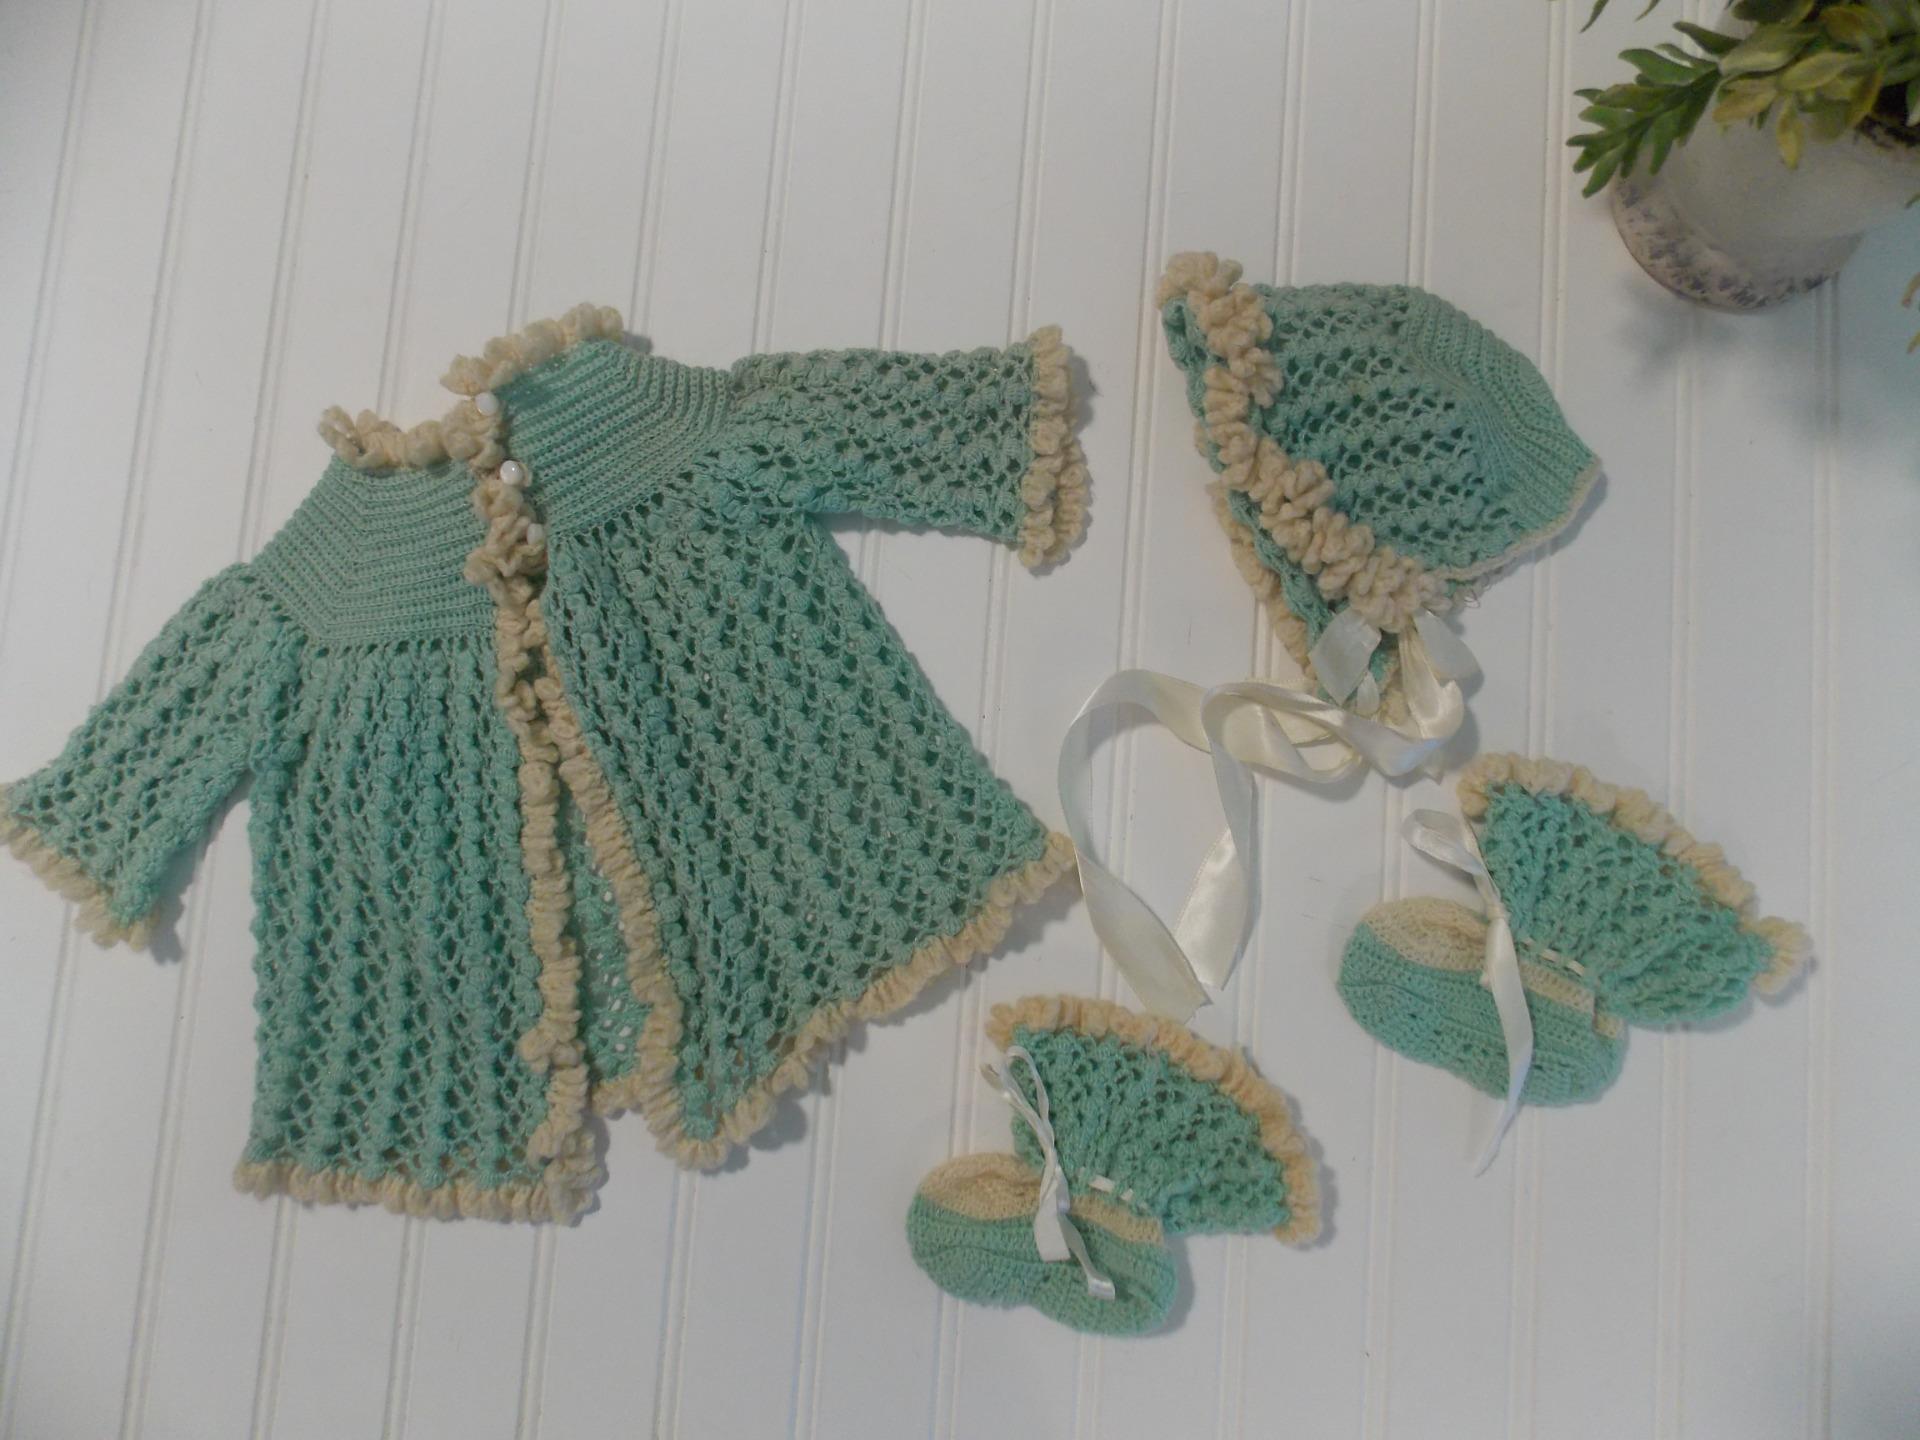 Handmade Crochet Infant boy sweater set